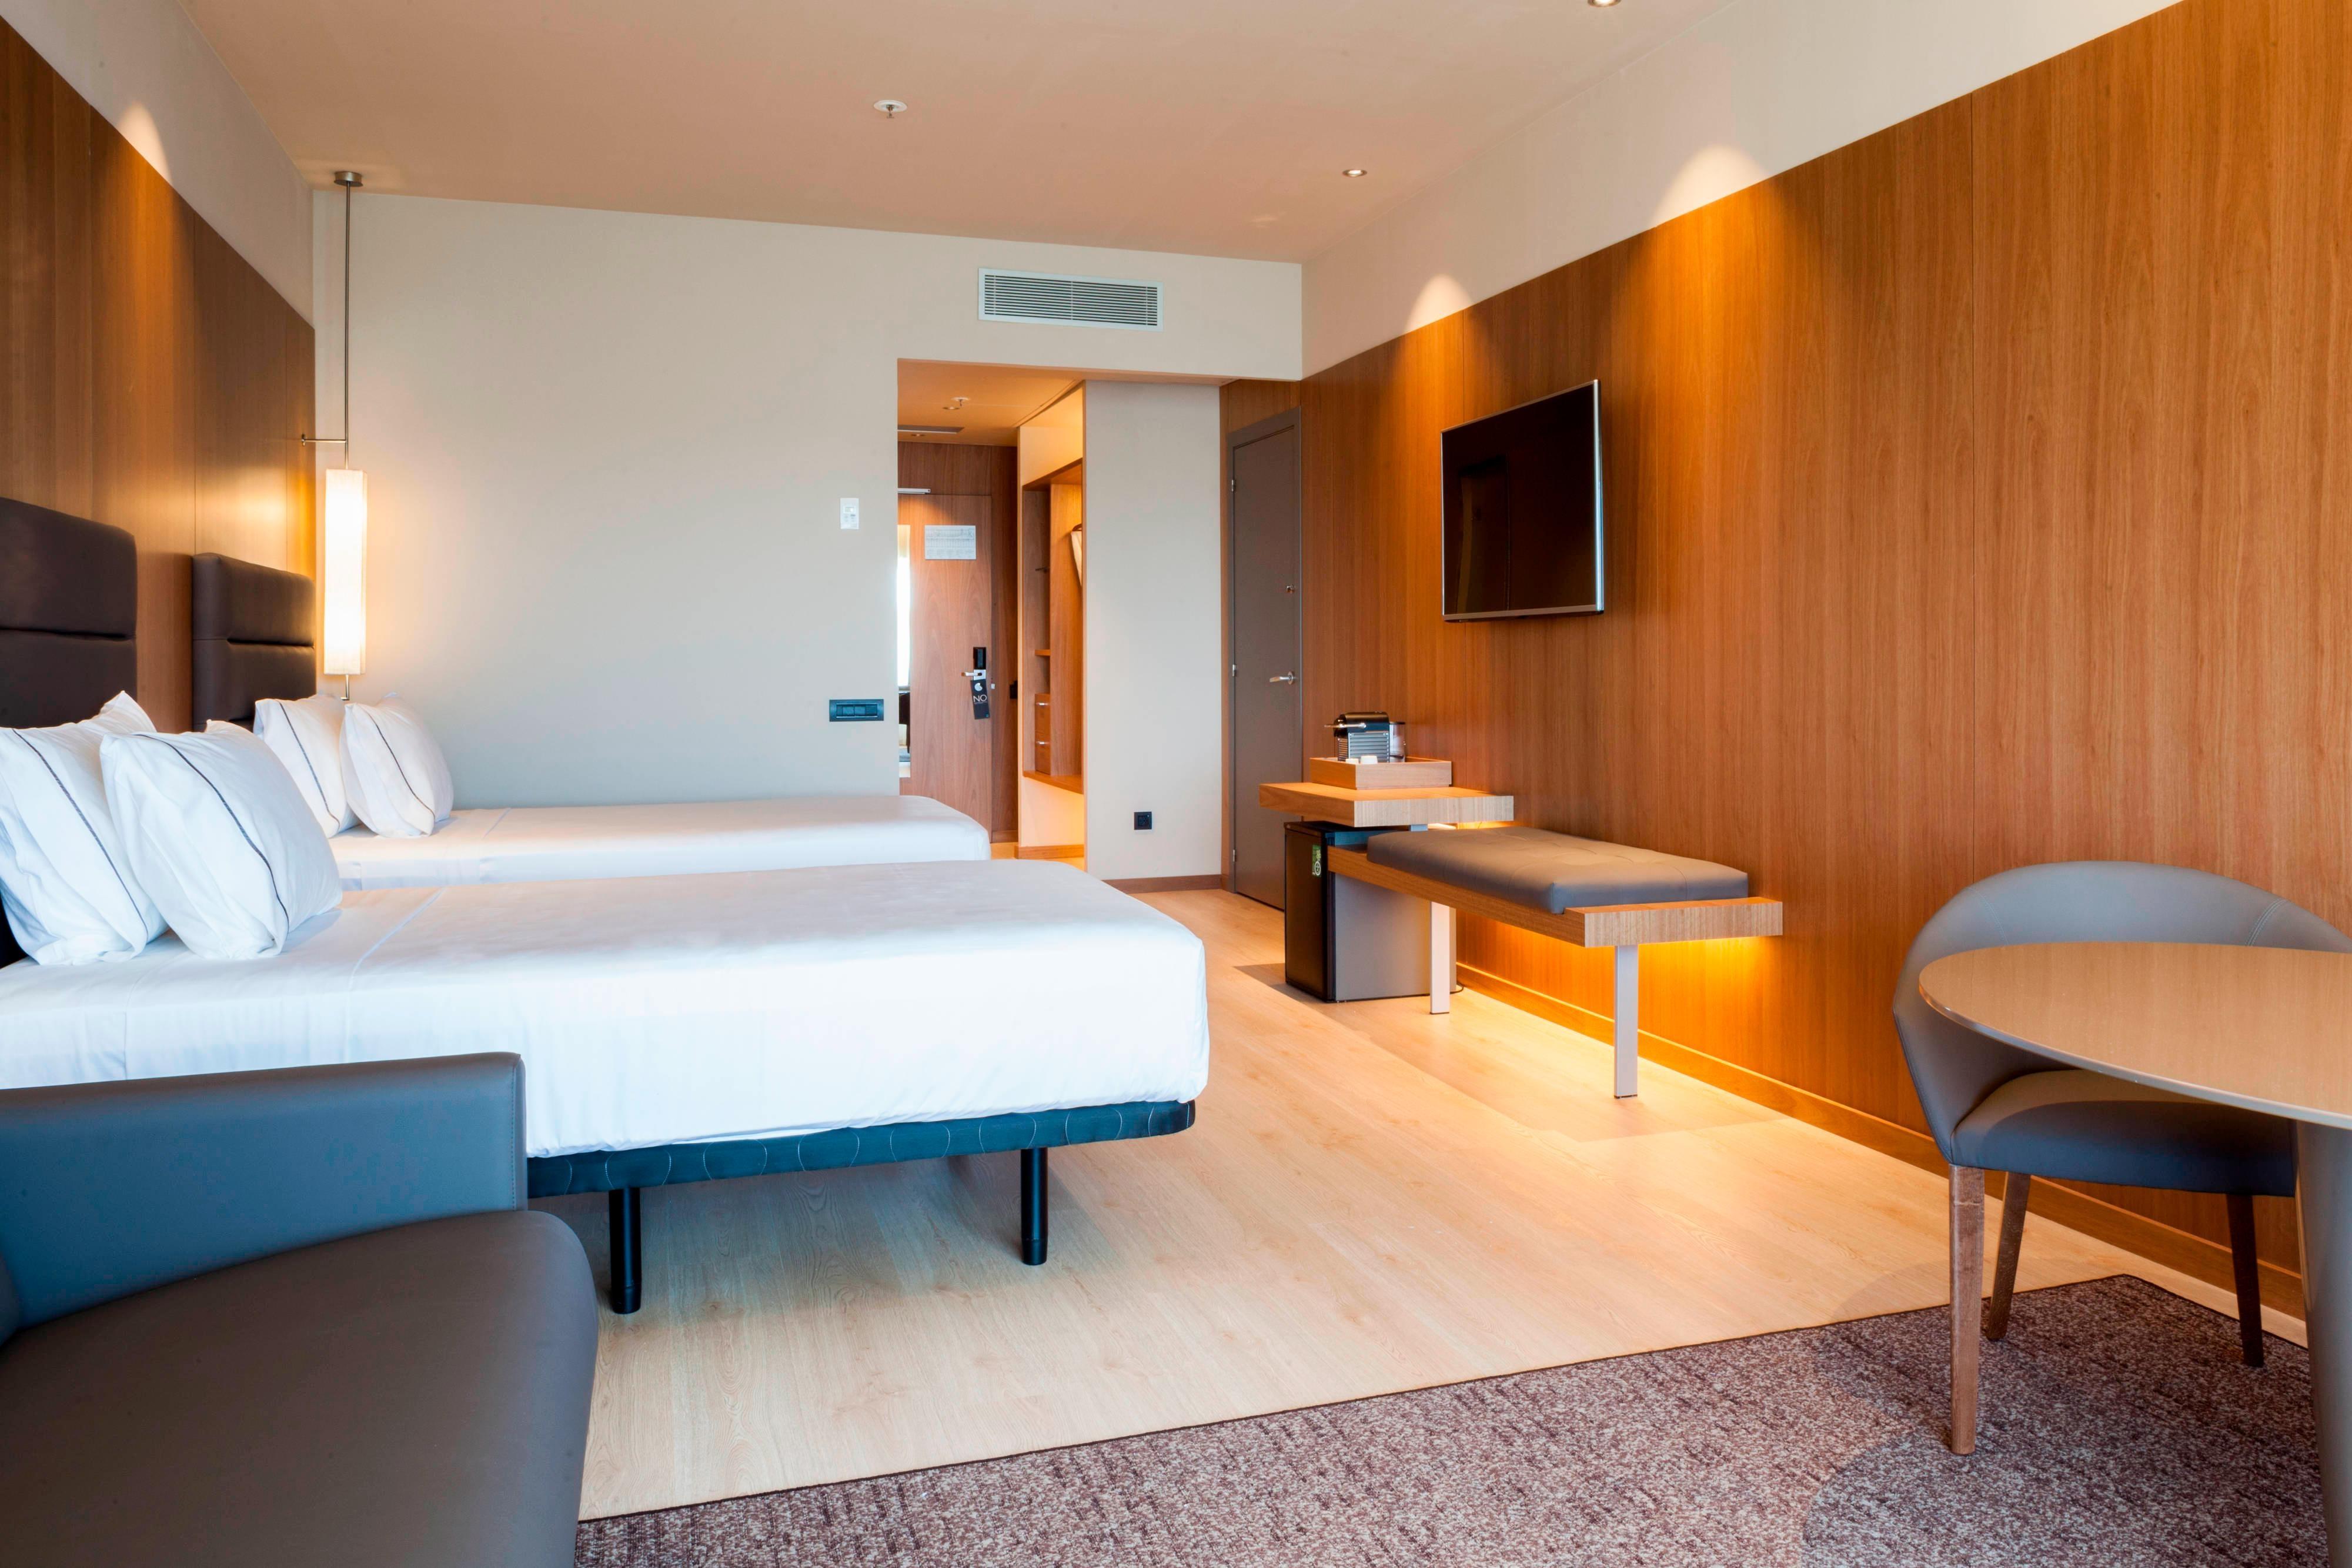 AC Hotel Diagonal L'Illa Barcelona